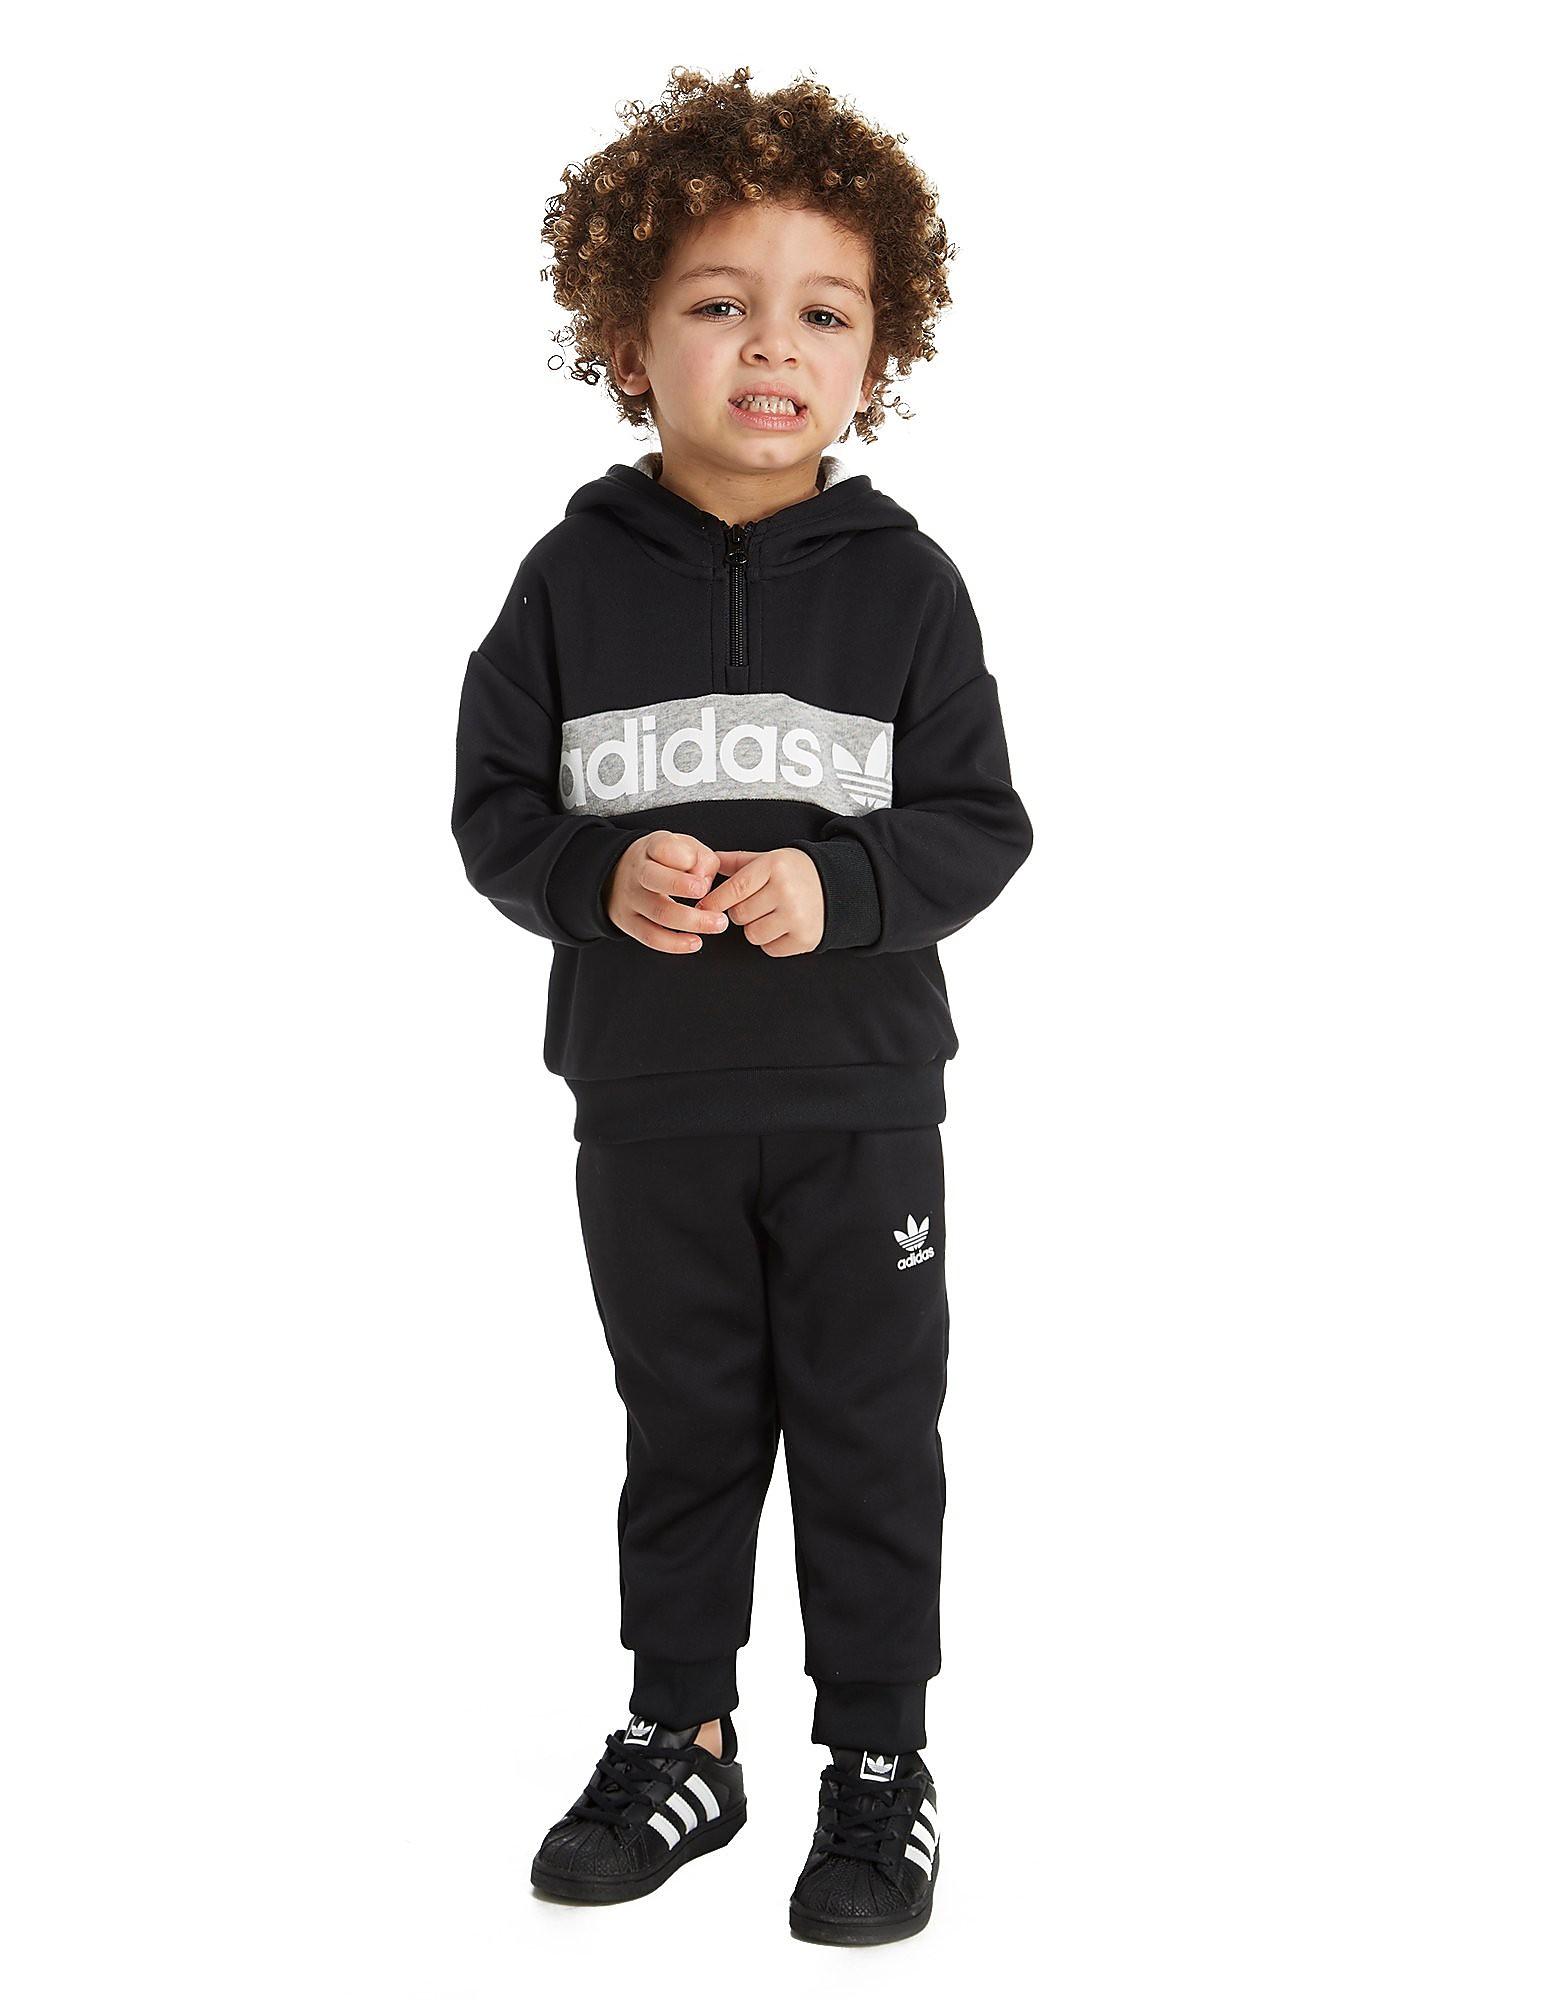 adidas Originals Trefoil 1/2 Zip Suit Infant